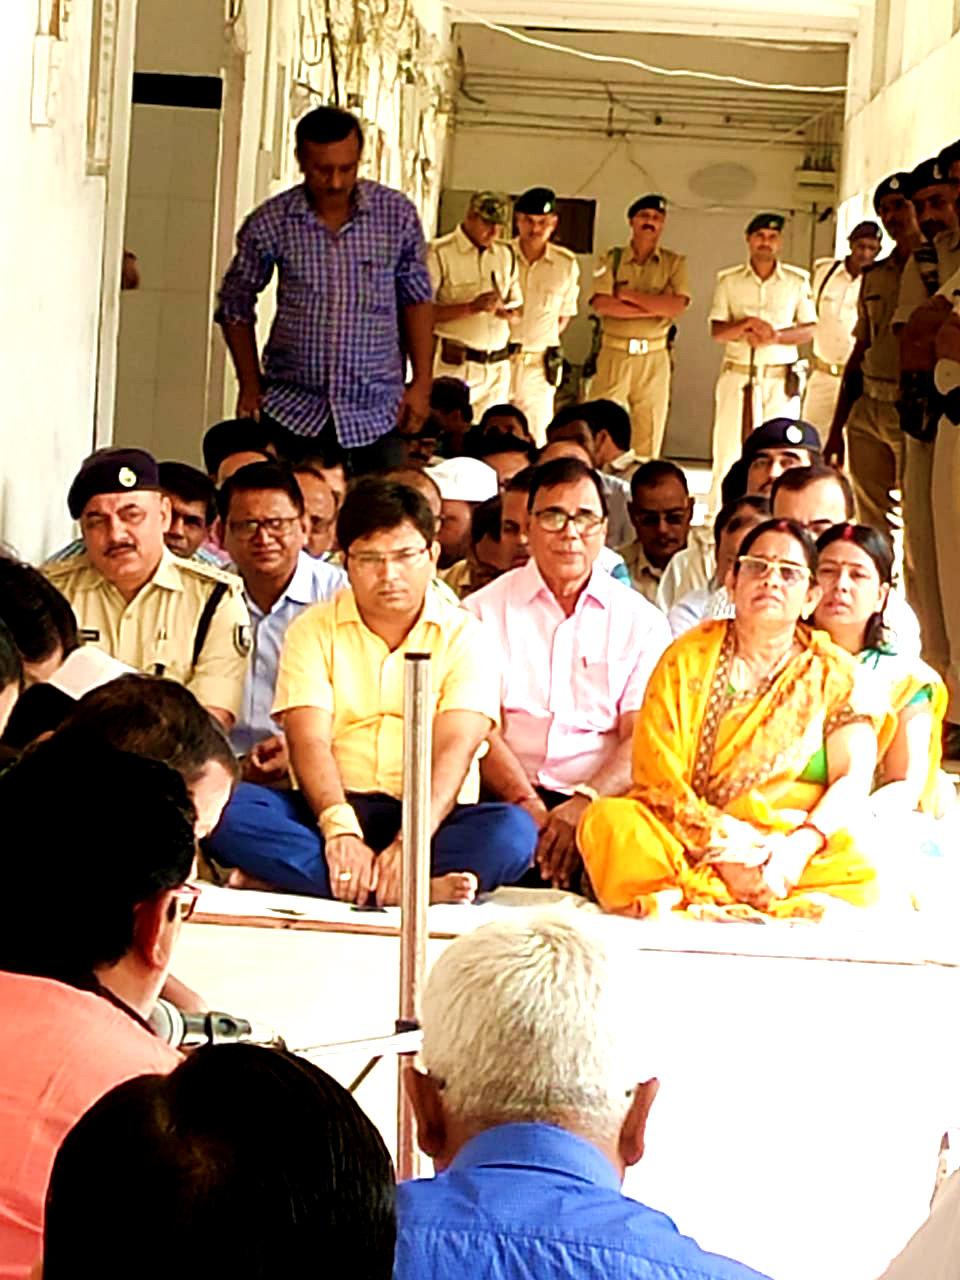 Samajsevi Dr.Bhupendra Madhepuri along with DM Navdeep Shukla, SP Sanjay Kumar, Zila Parishad Adhyaksha Manju Devi, DDC Vinod Kumar Singh, ADM Upendra Kumar & others attending